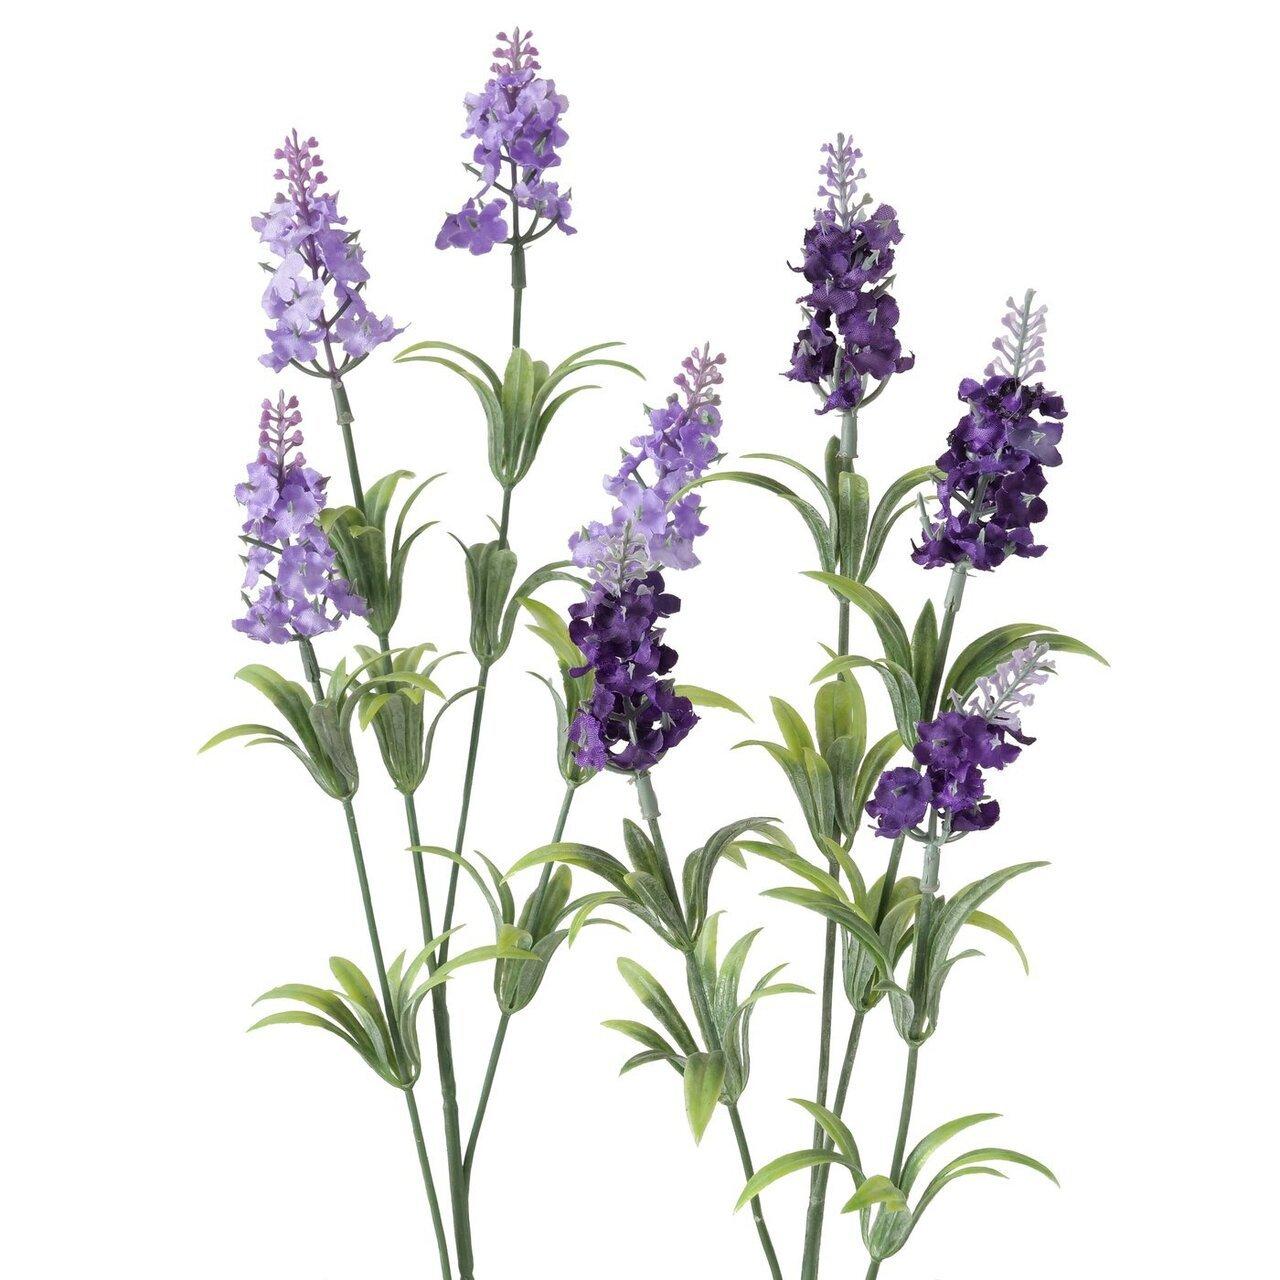 Boltze Deko Kunstblume Lavendel